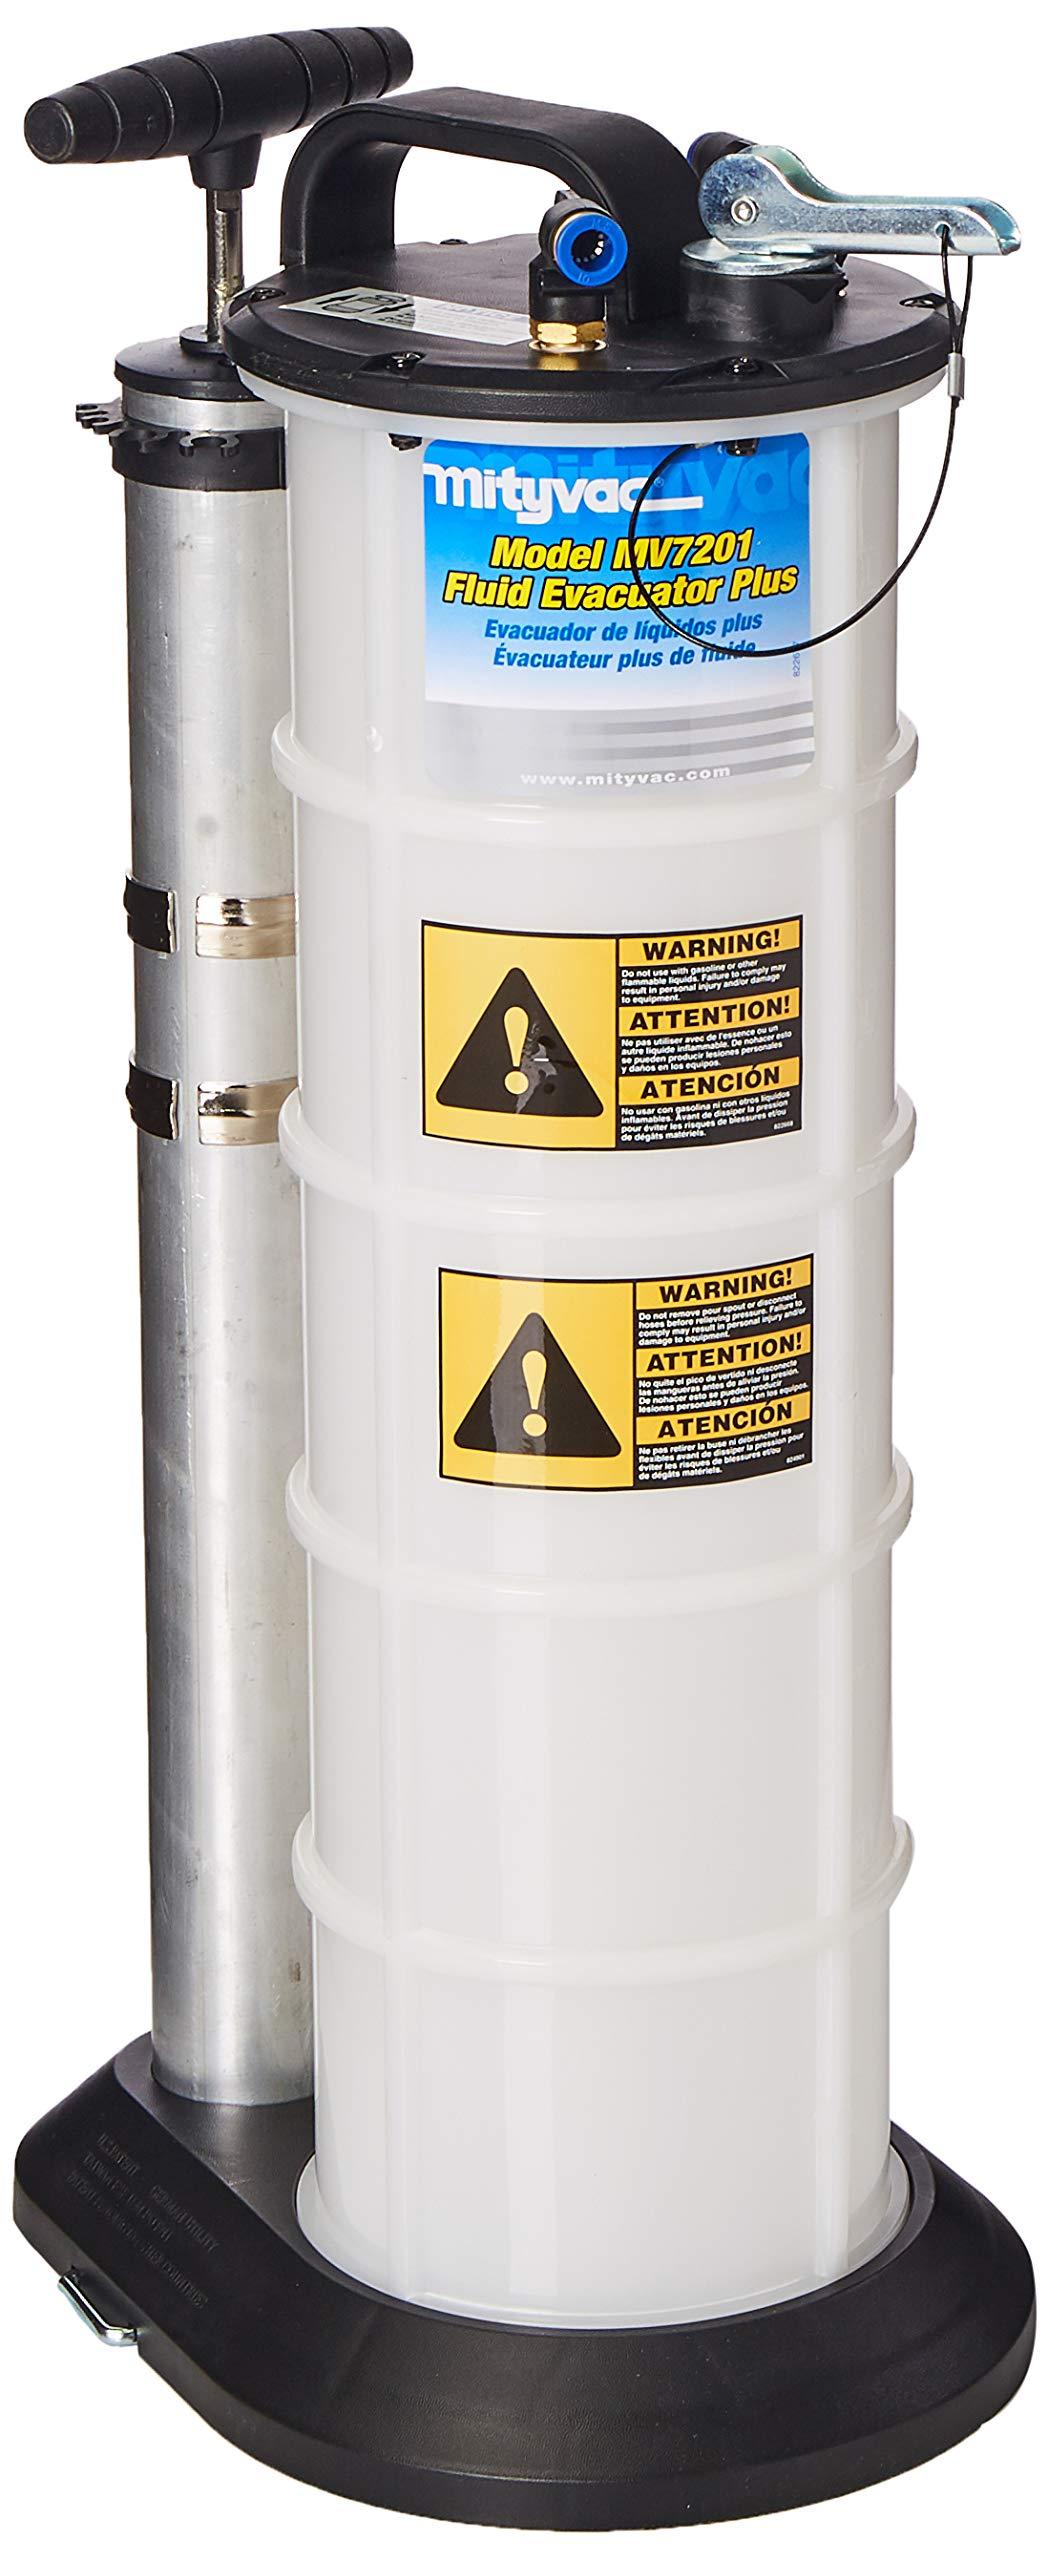 Mityvac 7201 Fluid Evacuator Plus by Mityvac